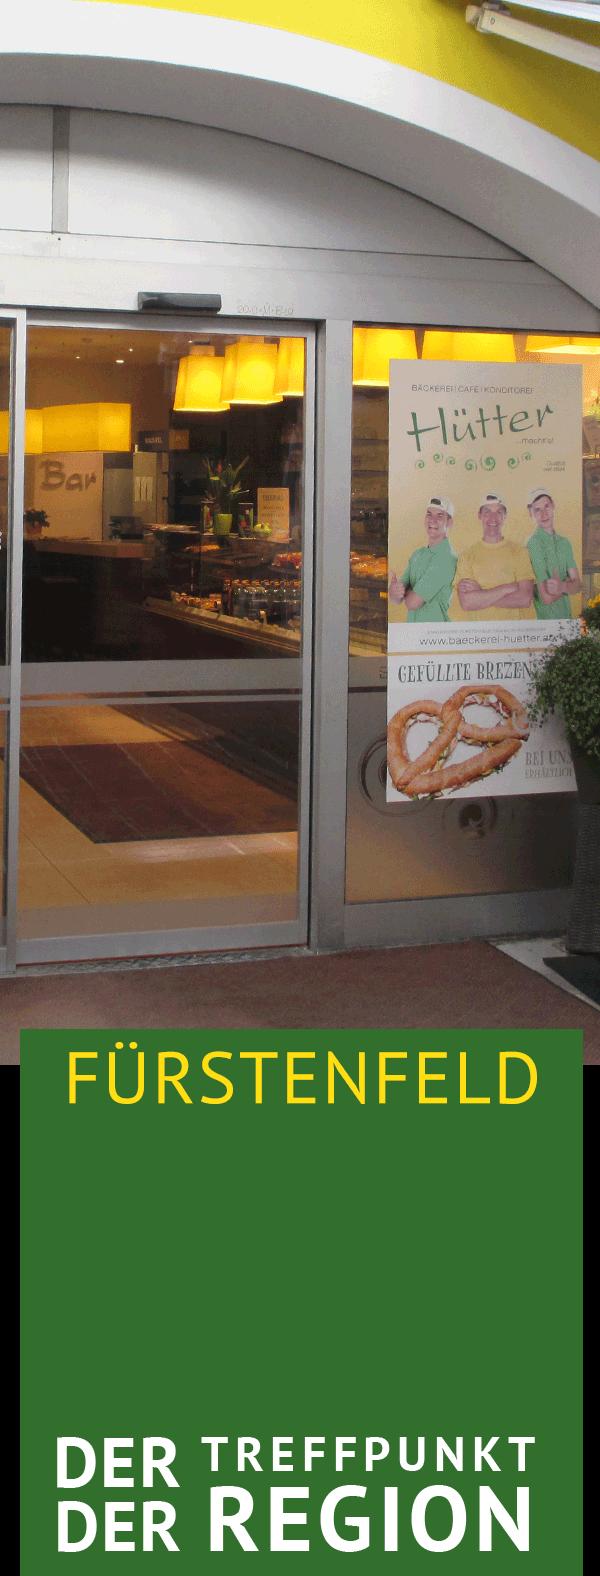 Bäckerei Hütter, Fürstenfeld